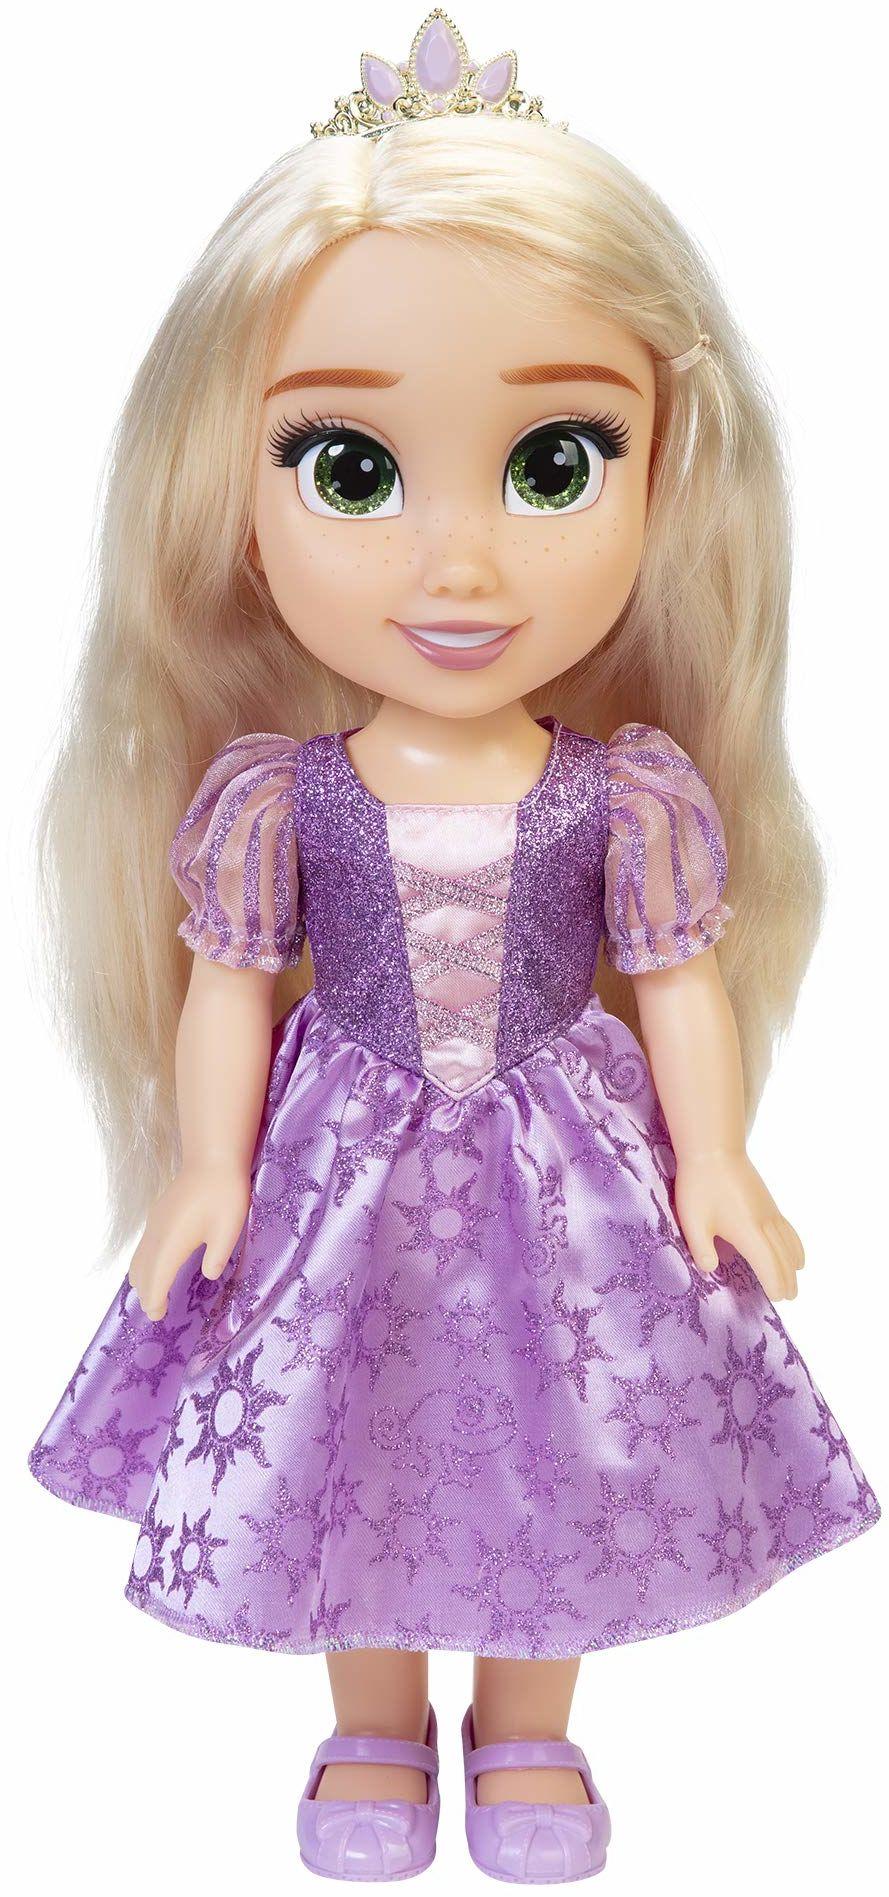 DP Roszpunka lalka 35 cm